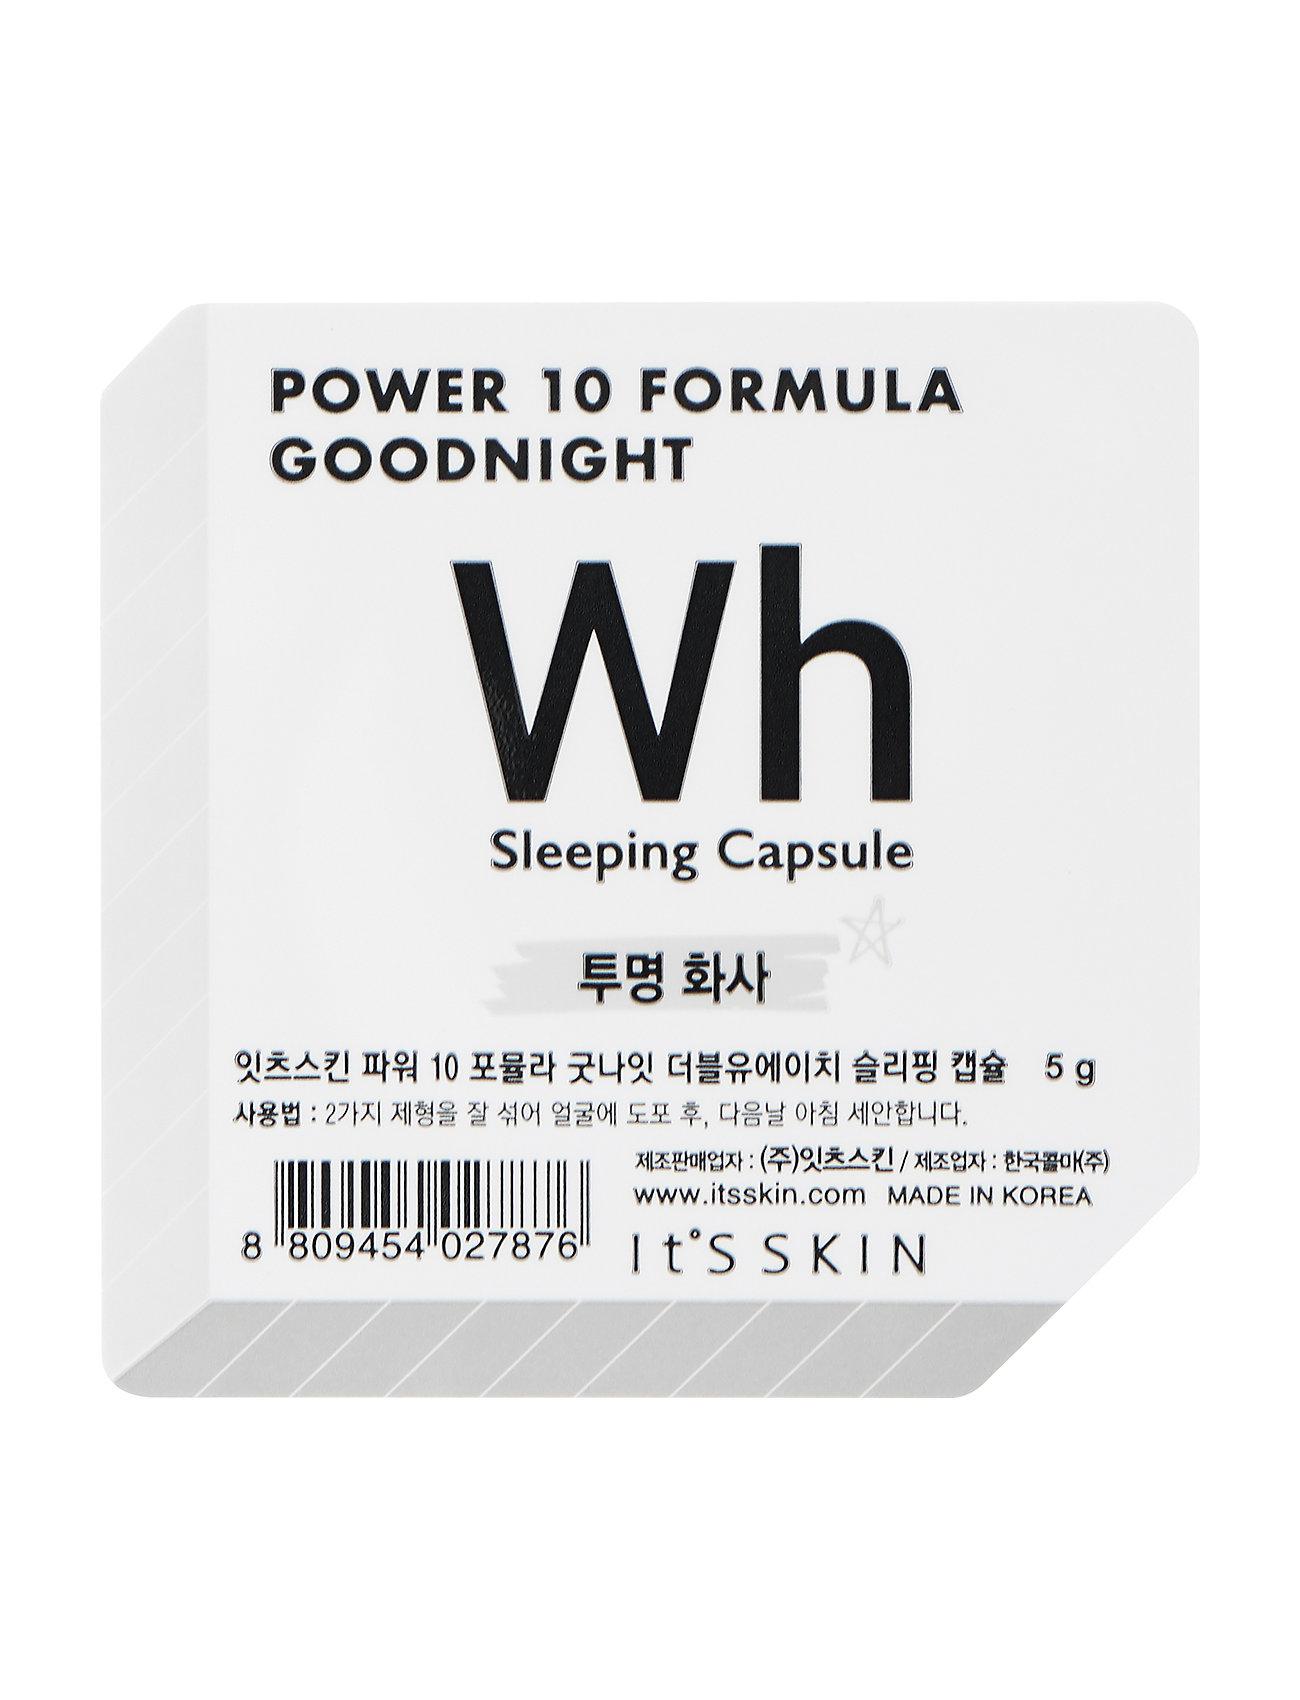 Image of It'S Skin Formula Goodnight Sleeping Capsule Wh Beauty WOMEN Skin Care Face Moisturizers Night Cream Nude It'S SKIN (3158644449)